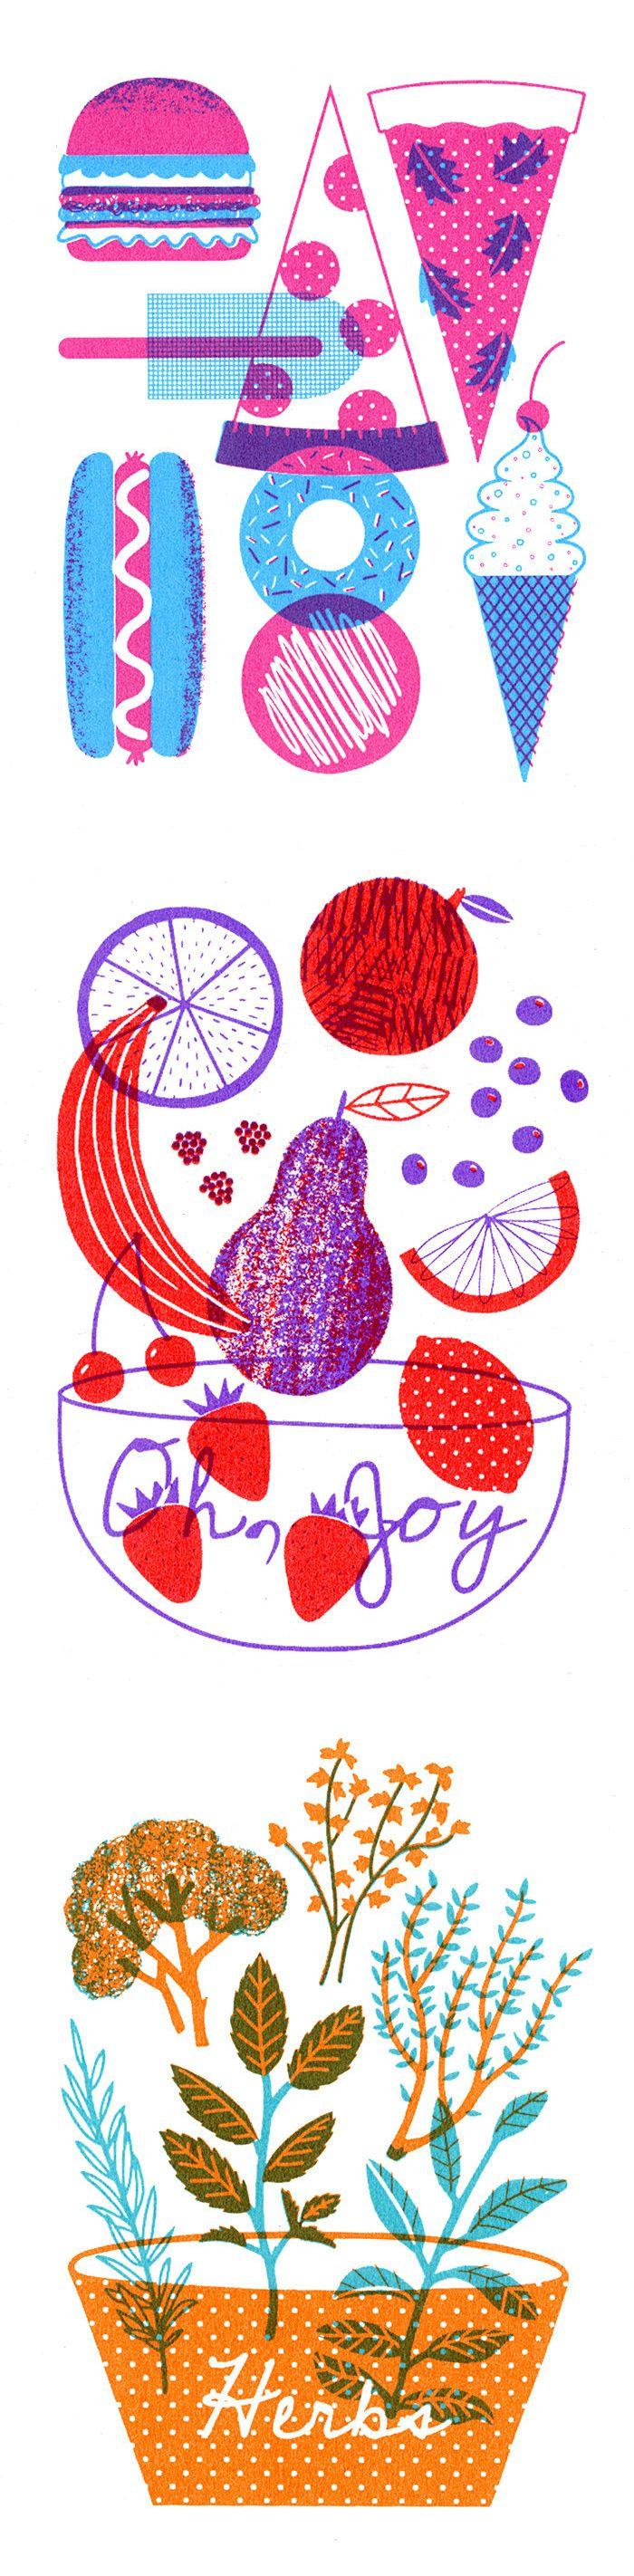 Boyoun Kim love the simple food illustration style